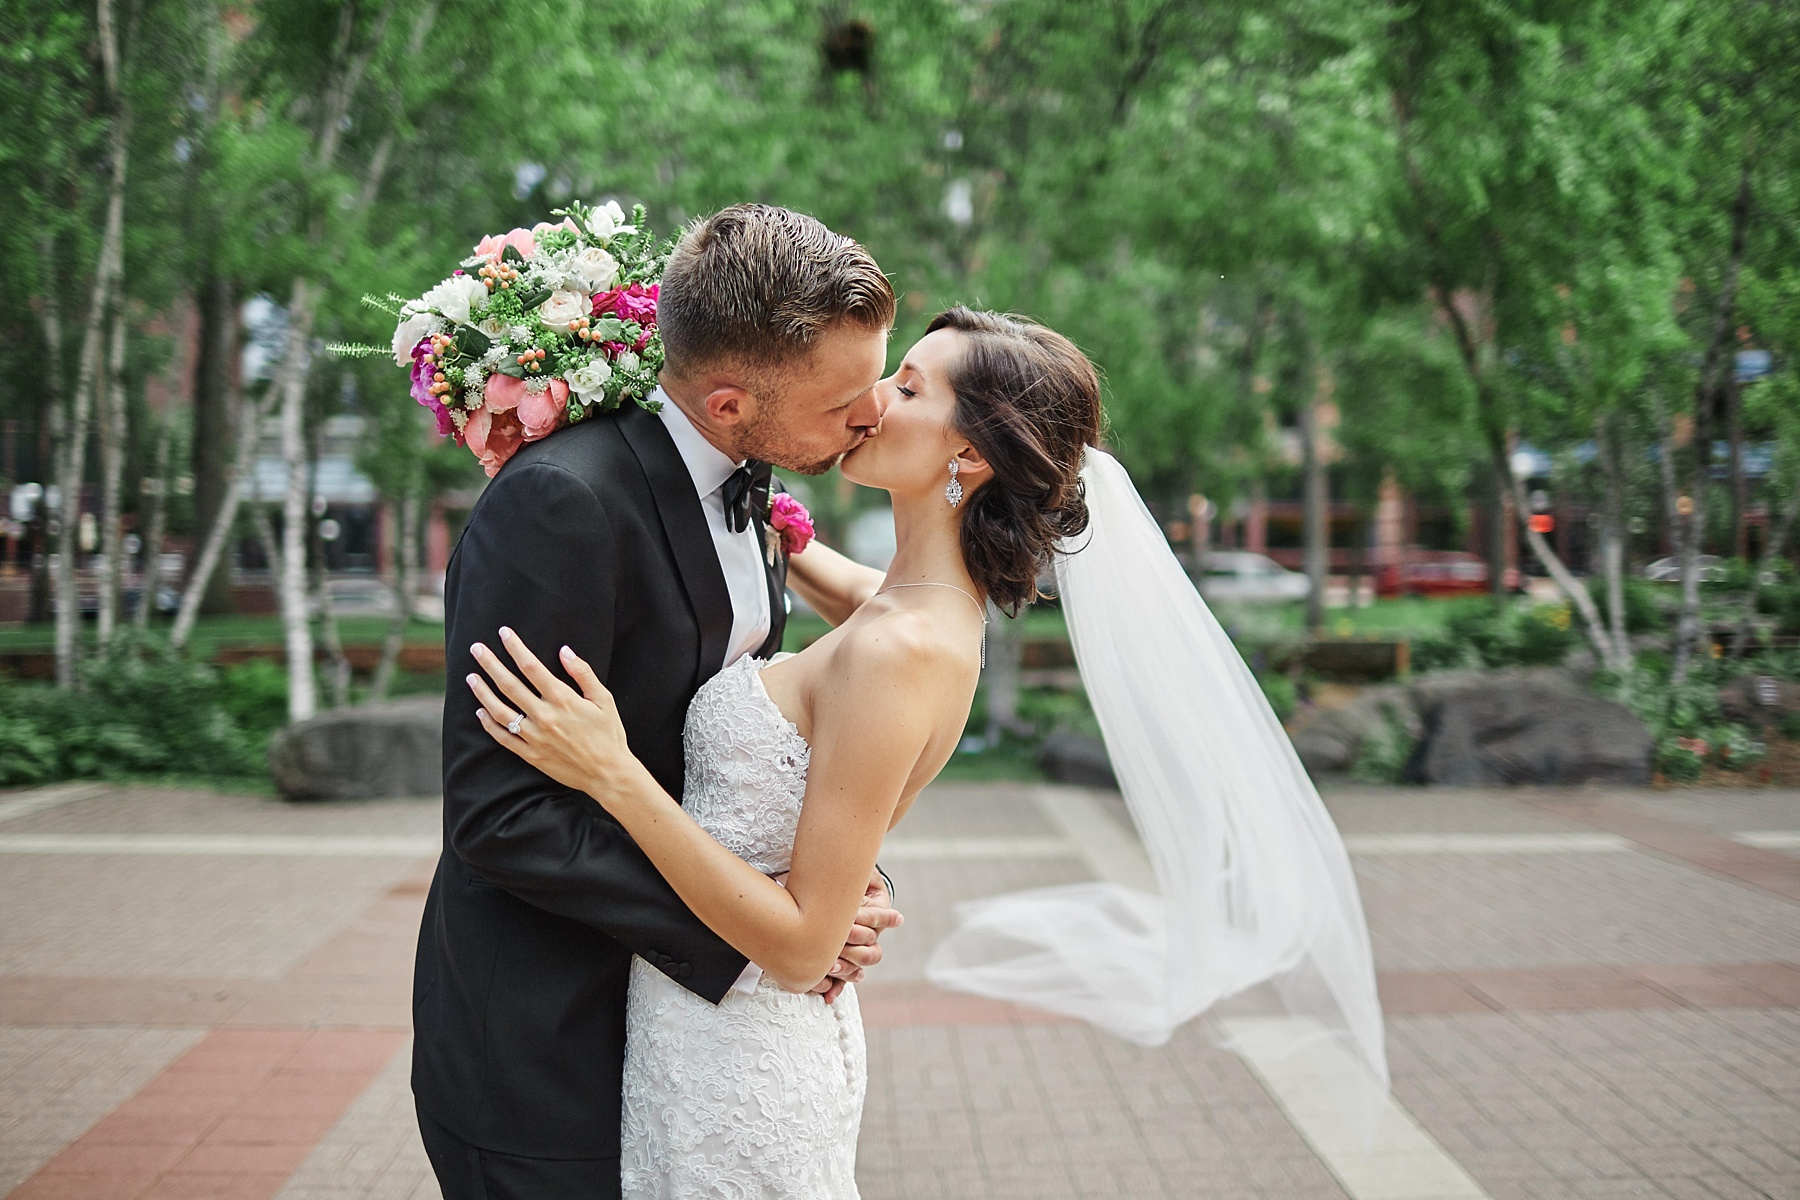 ABULAE-Wedding-Saint-paul-MN-Josh-Sofia-Wedding-Mears-Park_0788.jpg